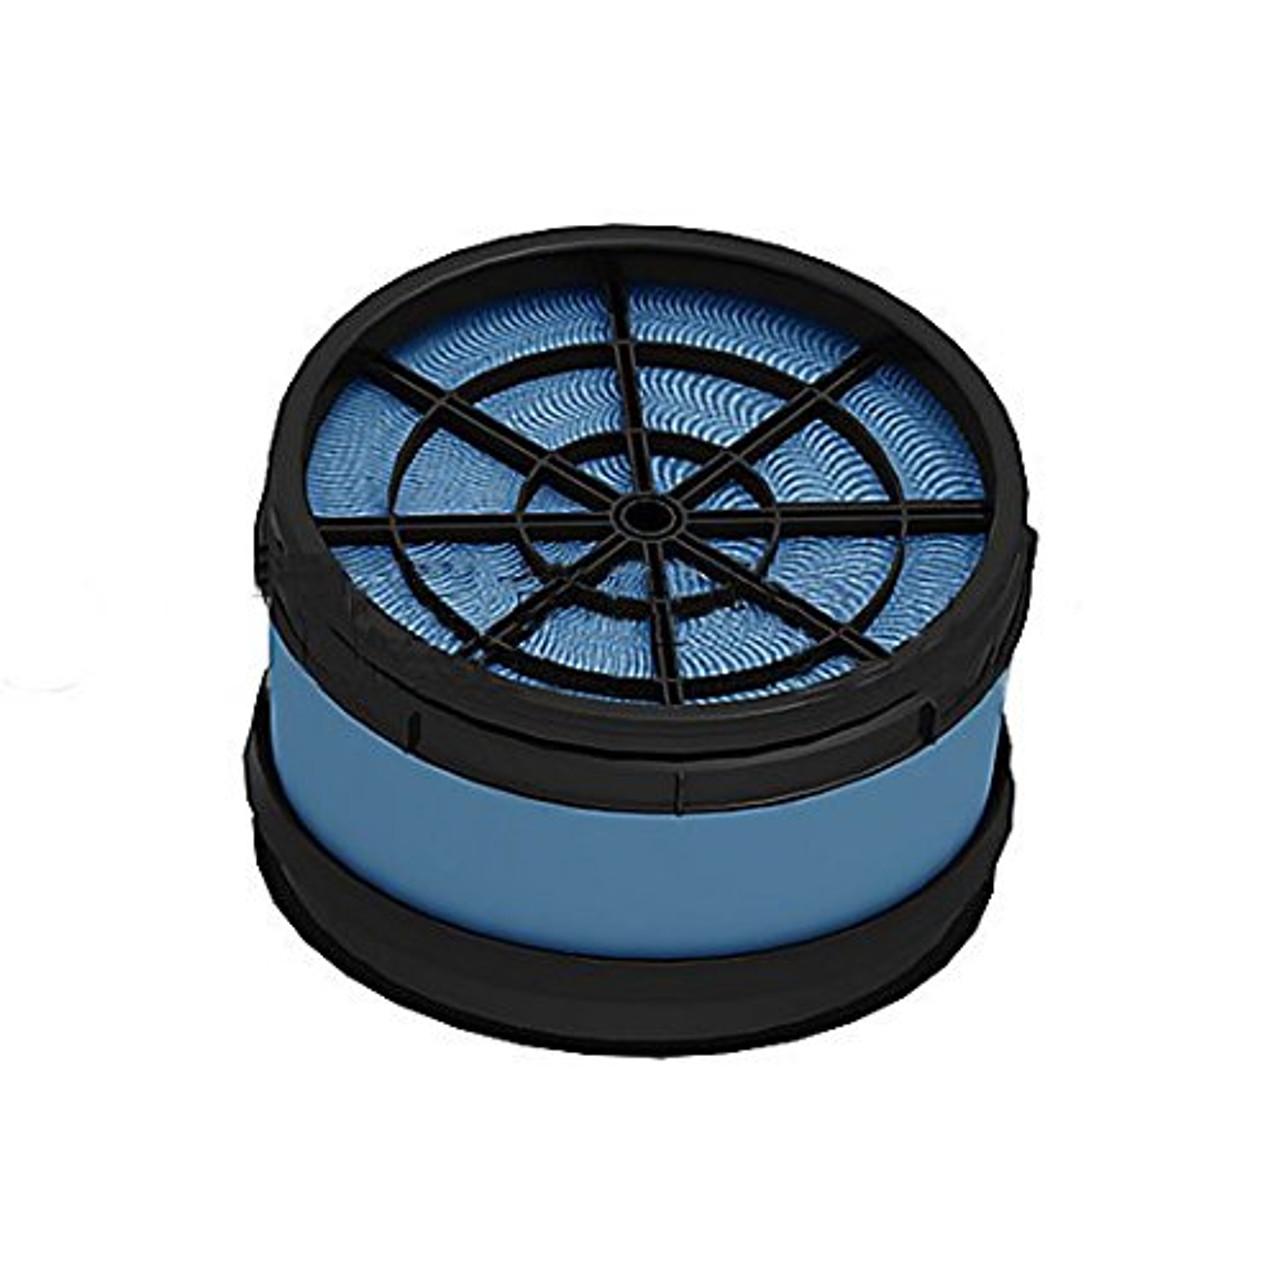 CAT 208-9065 Air filter (2089065)